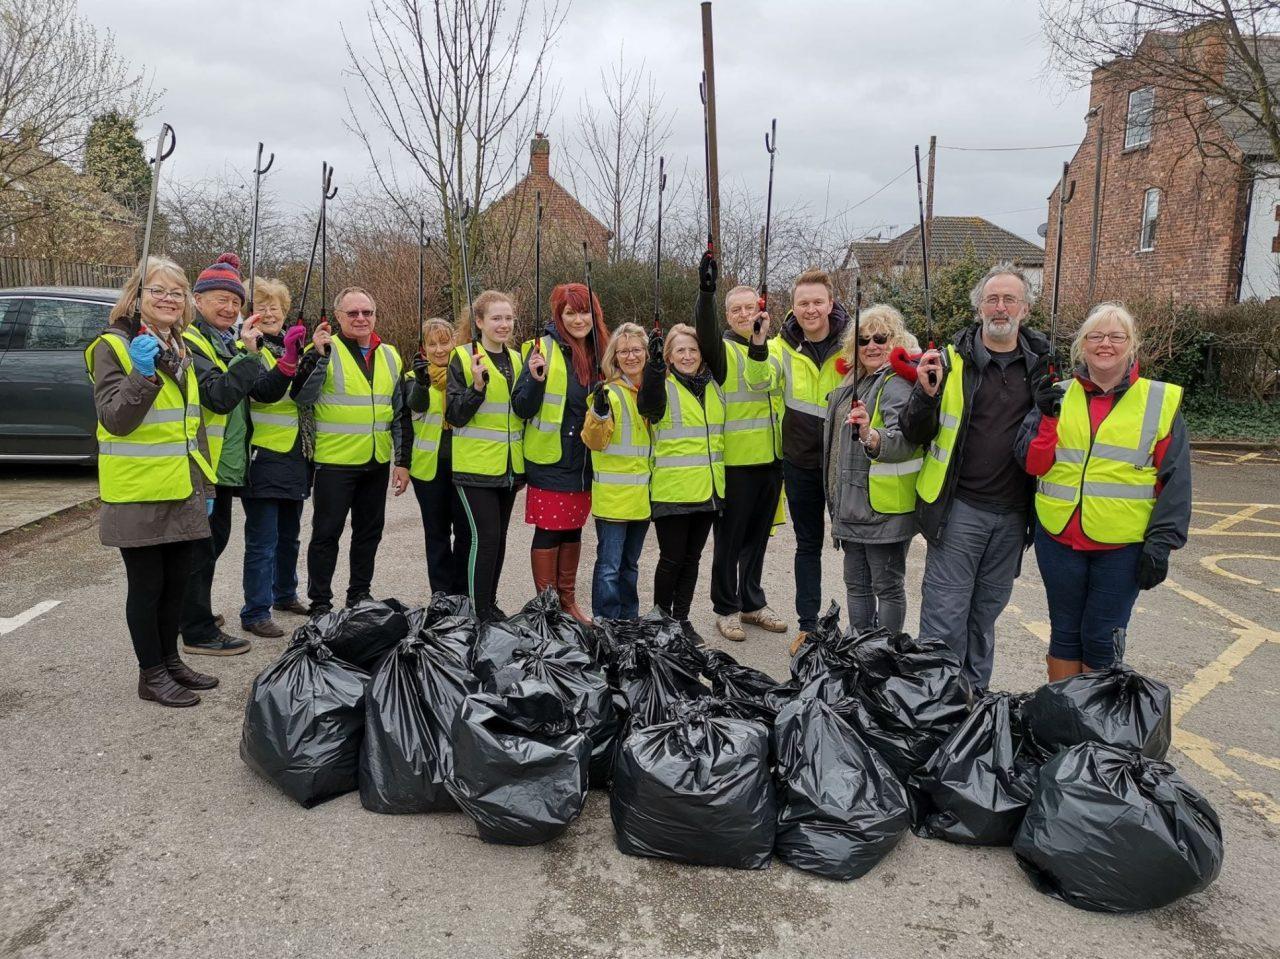 https://www.gedlingeye.co.uk/wp-content/uploads/2019/03/Redhill-responders-litter-pickers-1280x959.jpg